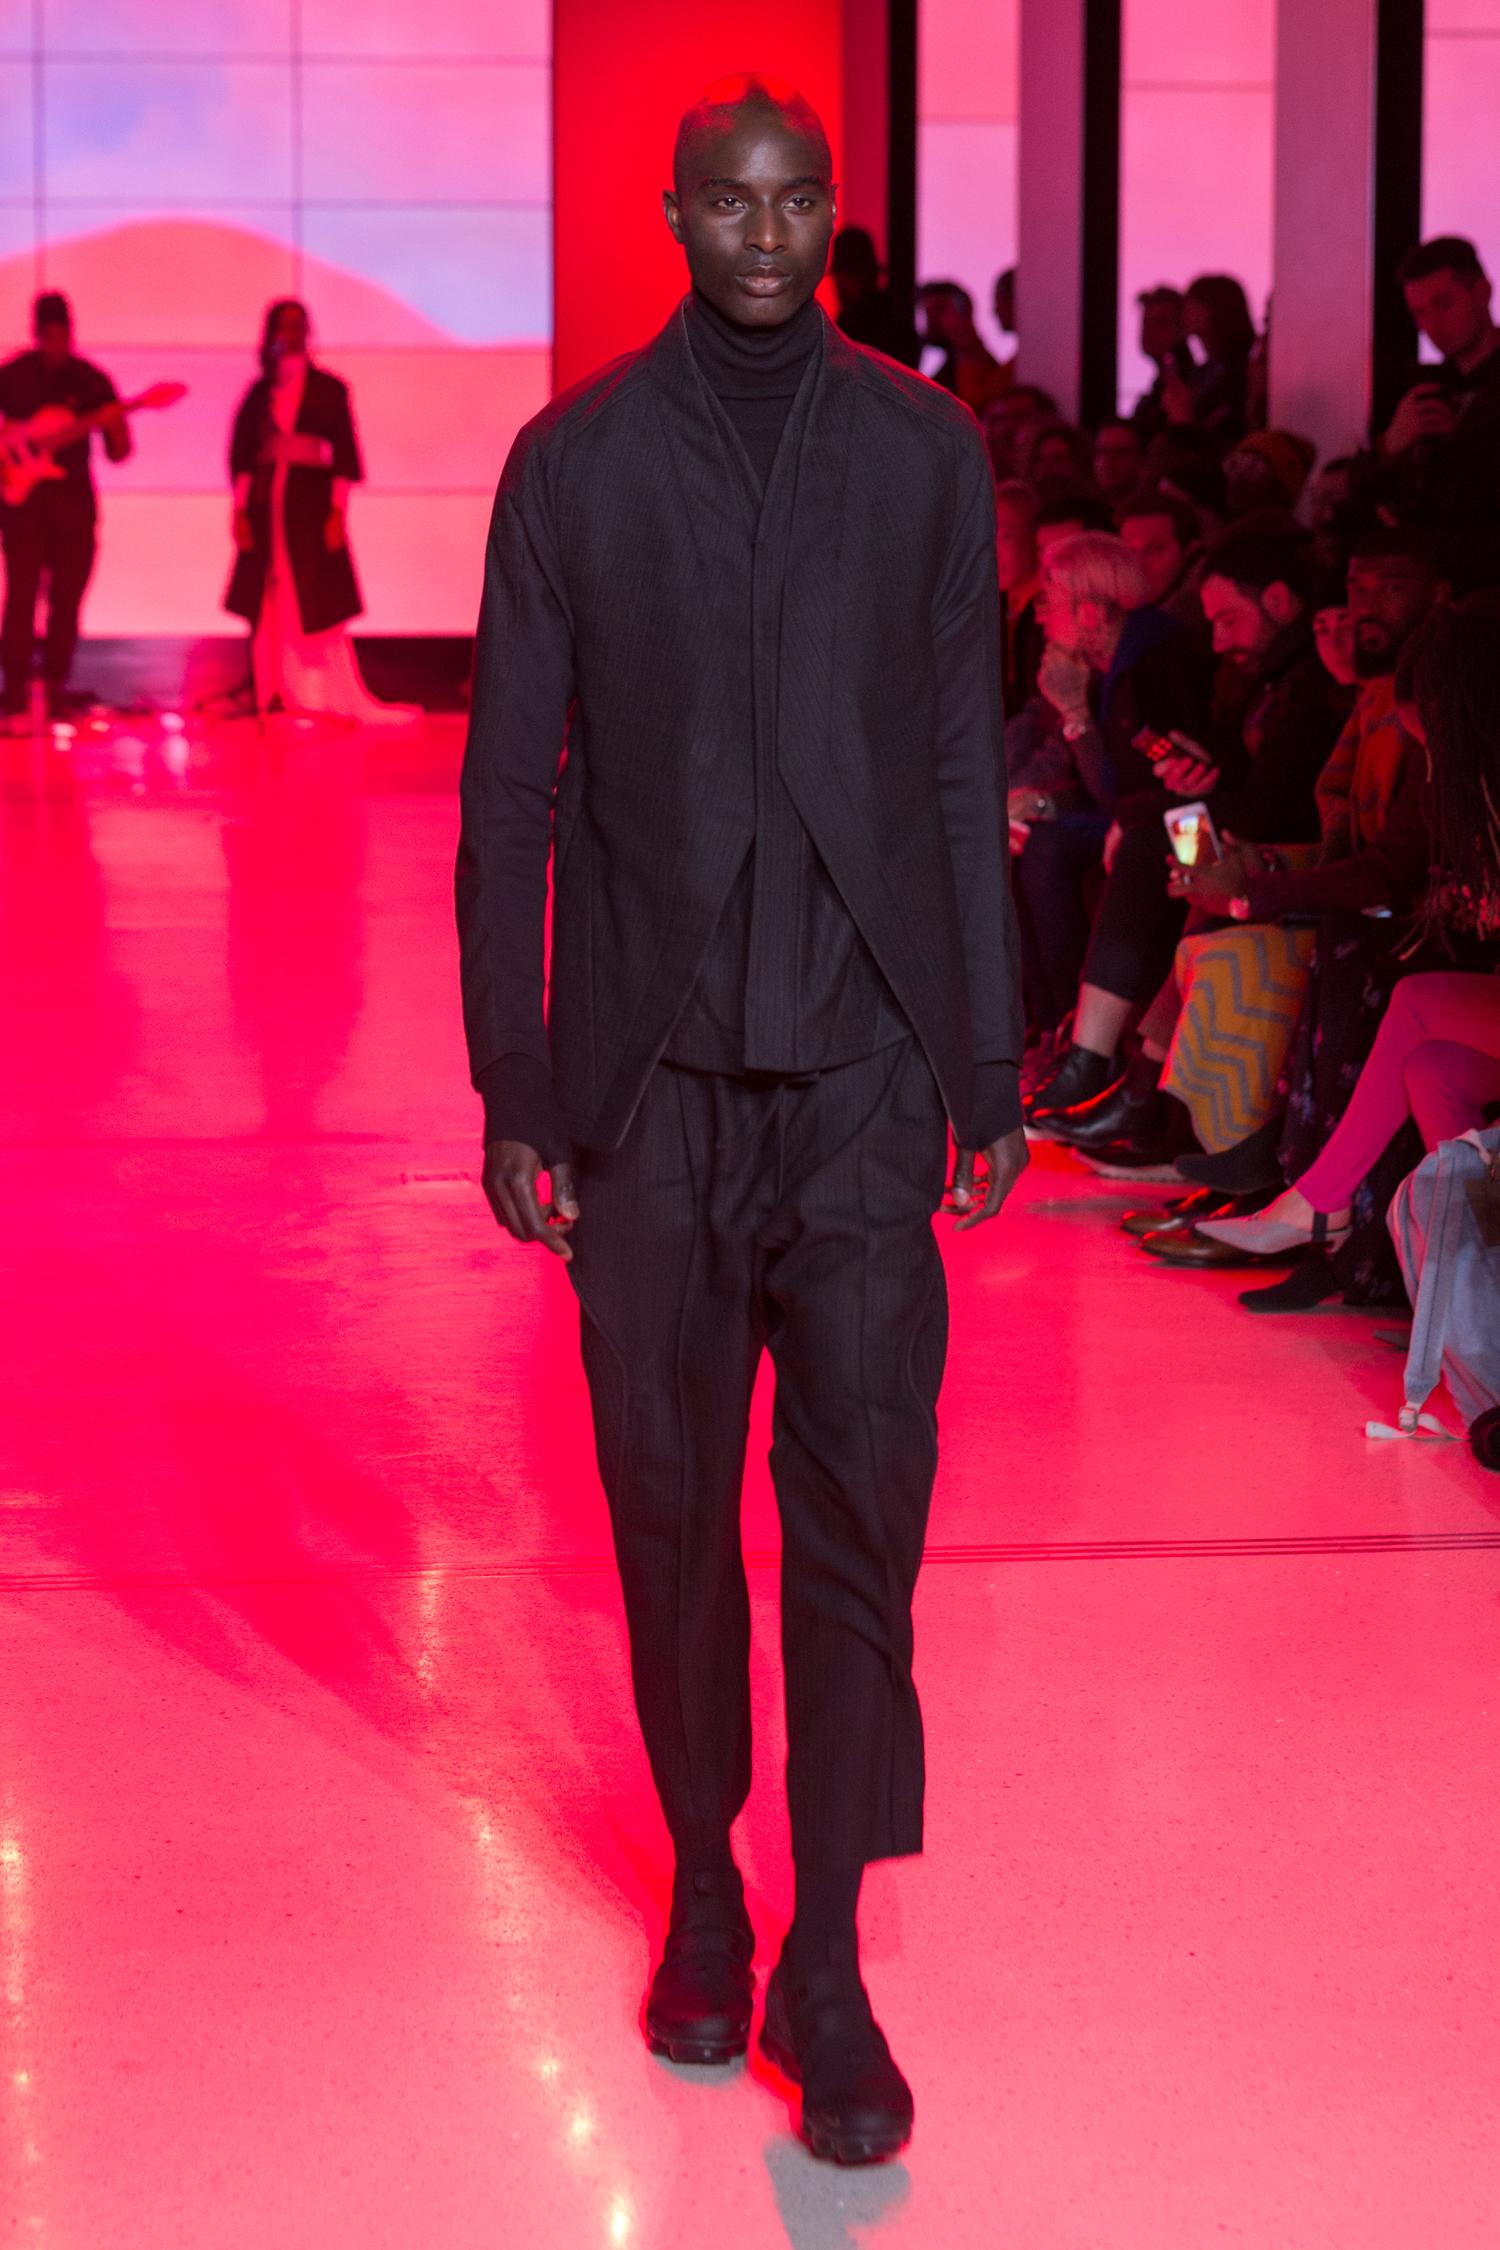 LOOK 1   ARC Jacket 5  / Black Wool   ARC Desert Shirt  / Black Wool   ARC Turtleneck  / Black Terry   ARC Taos Pant  / Black Wool   Nike Air VaporMax Utility